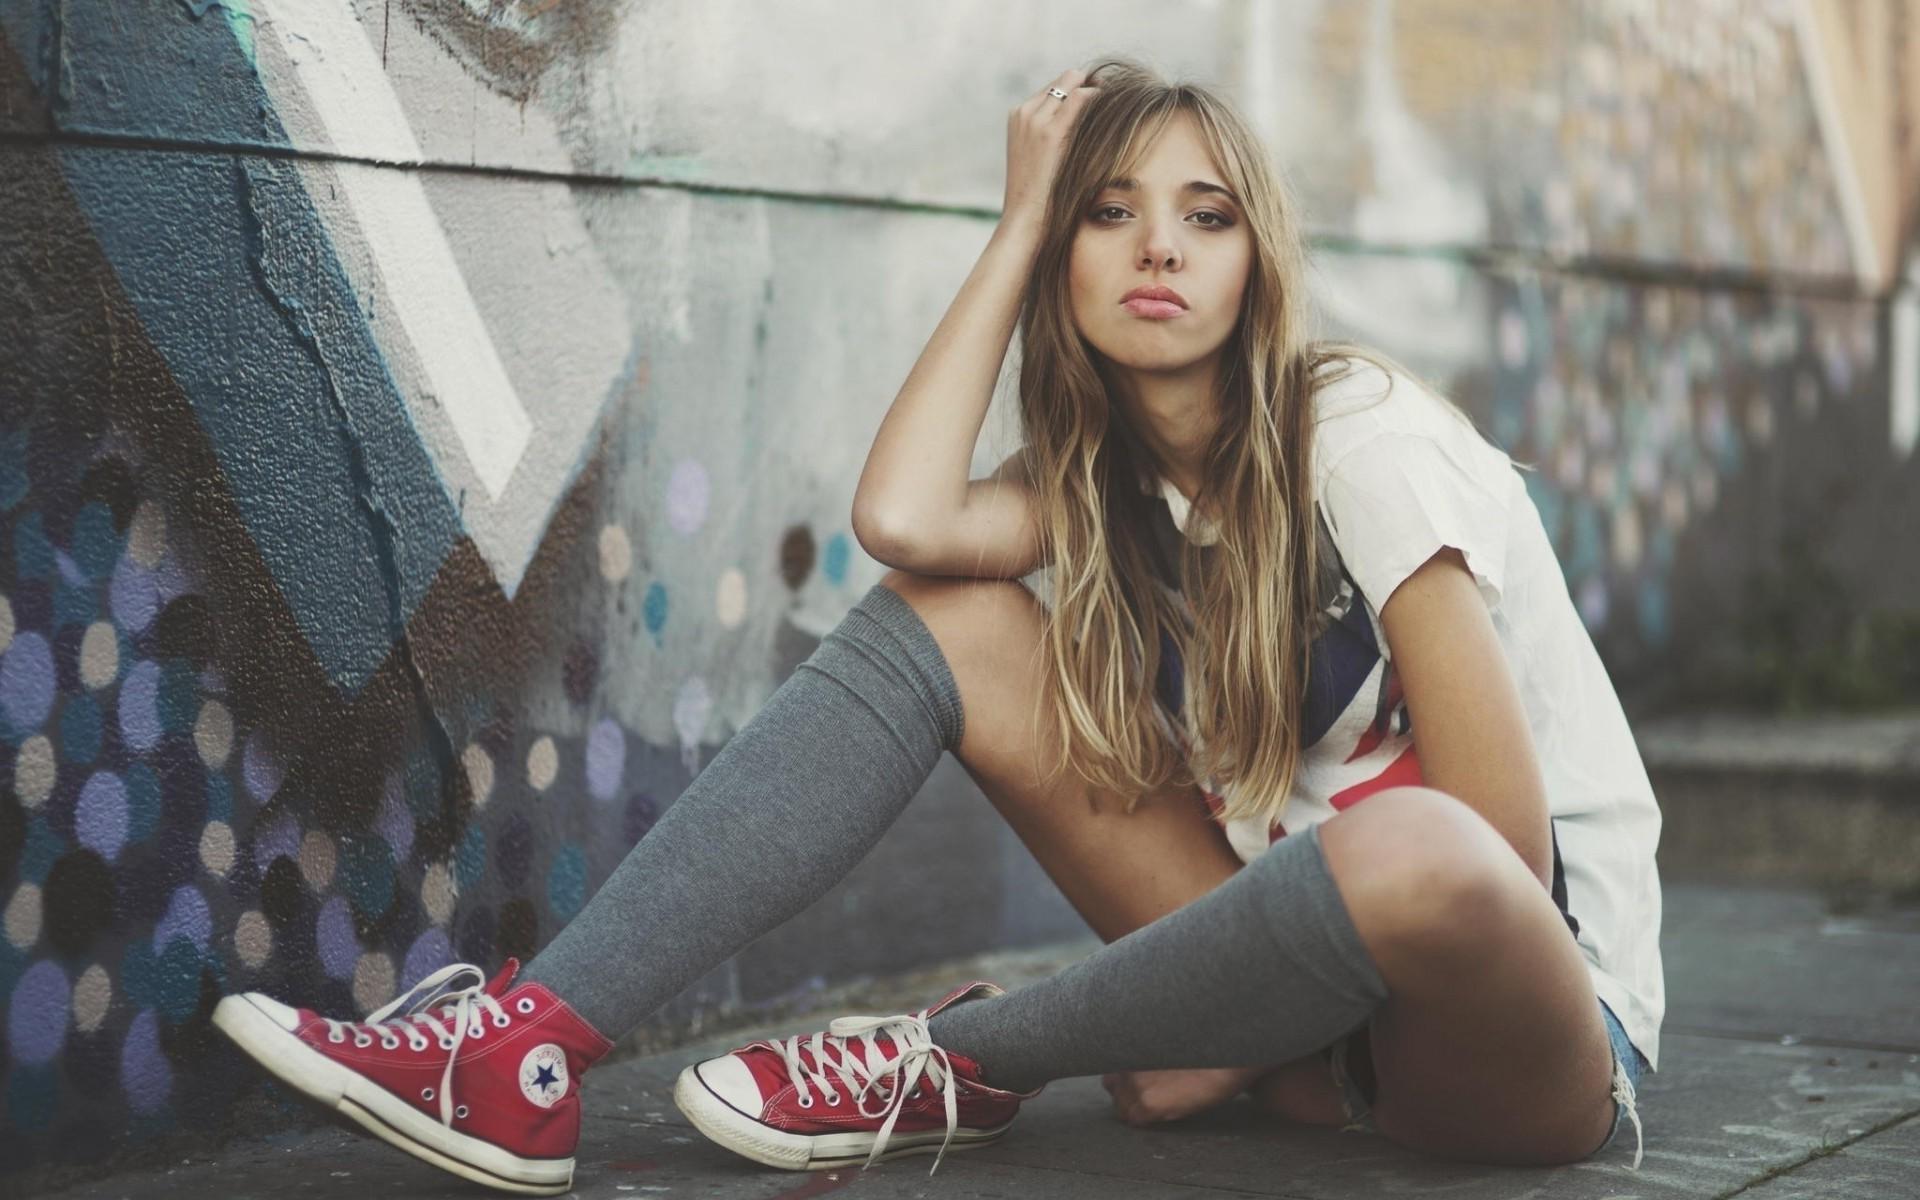 Girl Skateboards Wallpaper Hd Wallpaper Women Model Blonde Sitting Photography